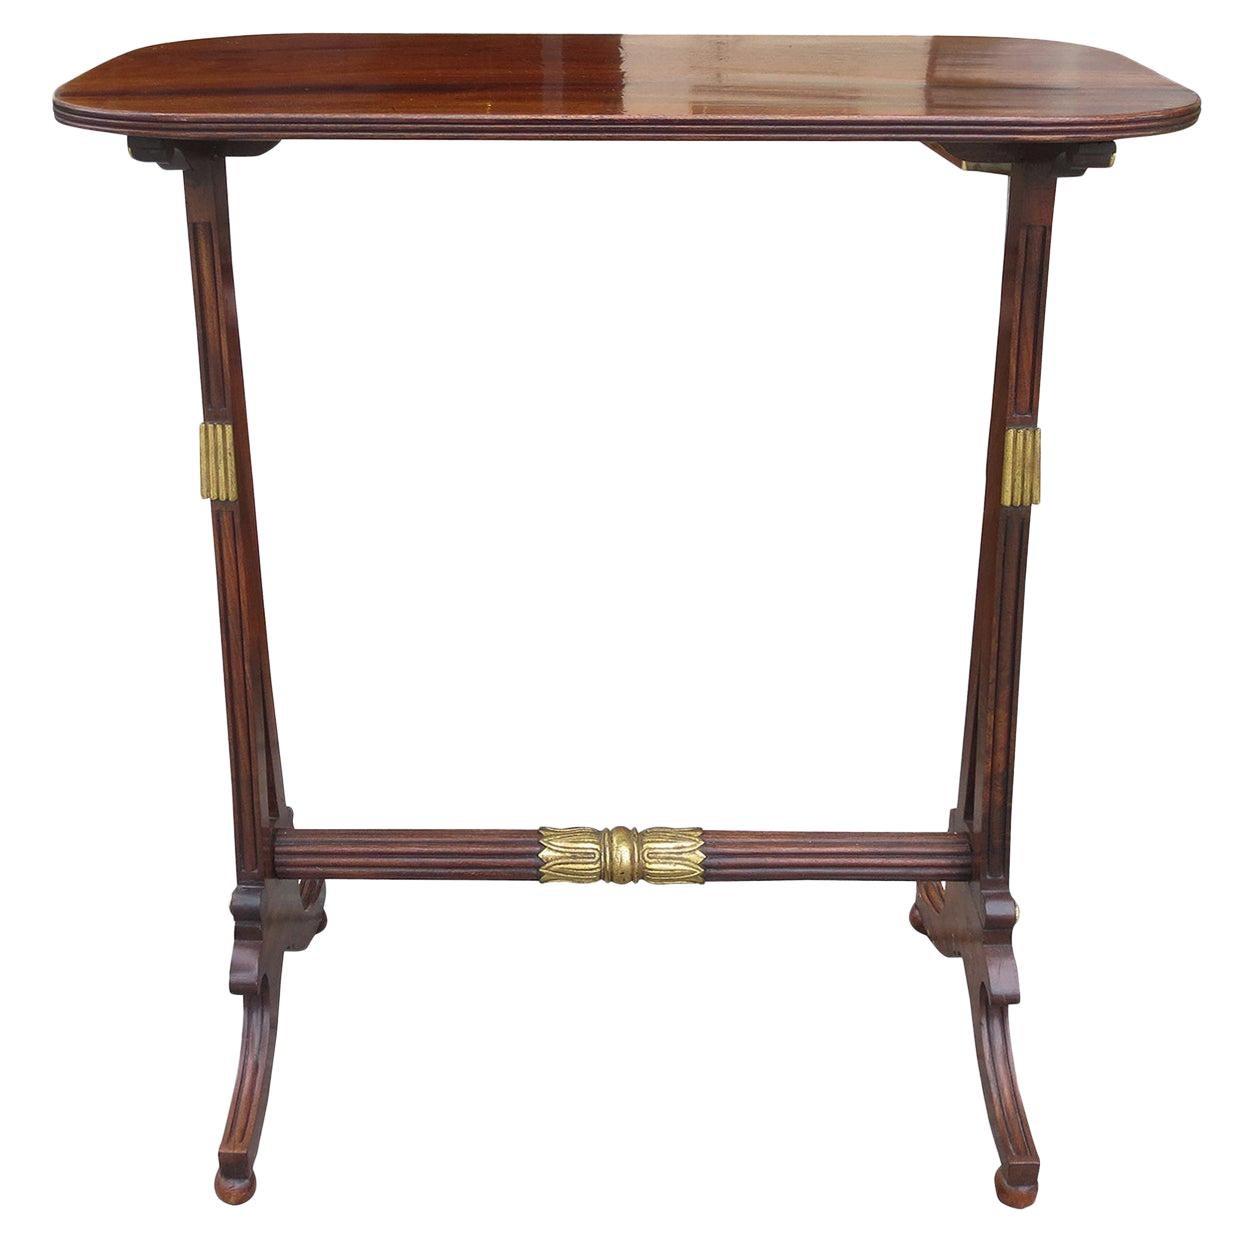 19th Century English Regency Table